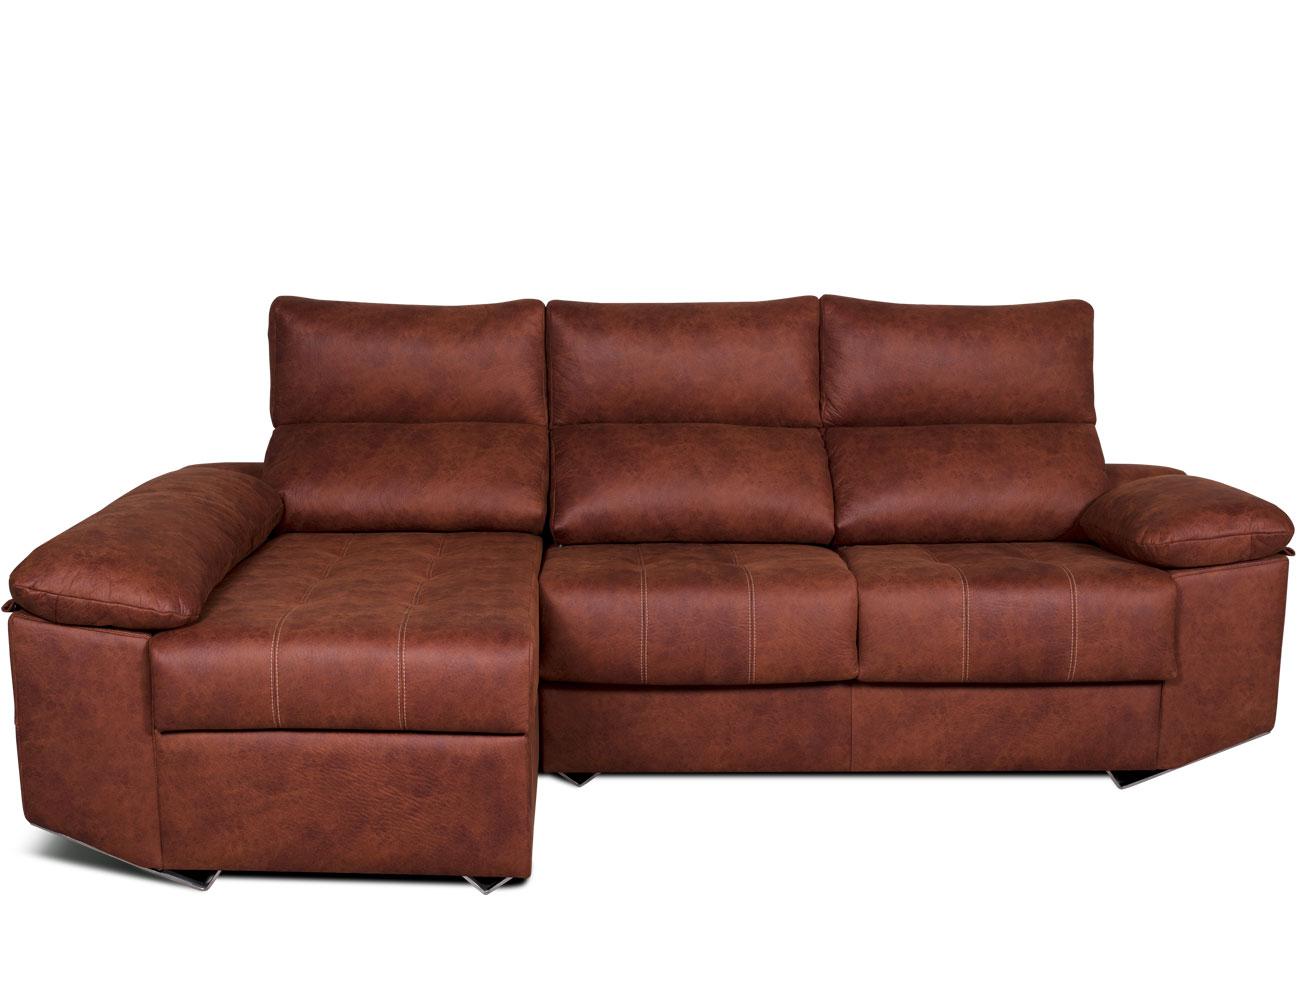 Sofa chaiselongue moderno patas forma tejido anti manchas 214